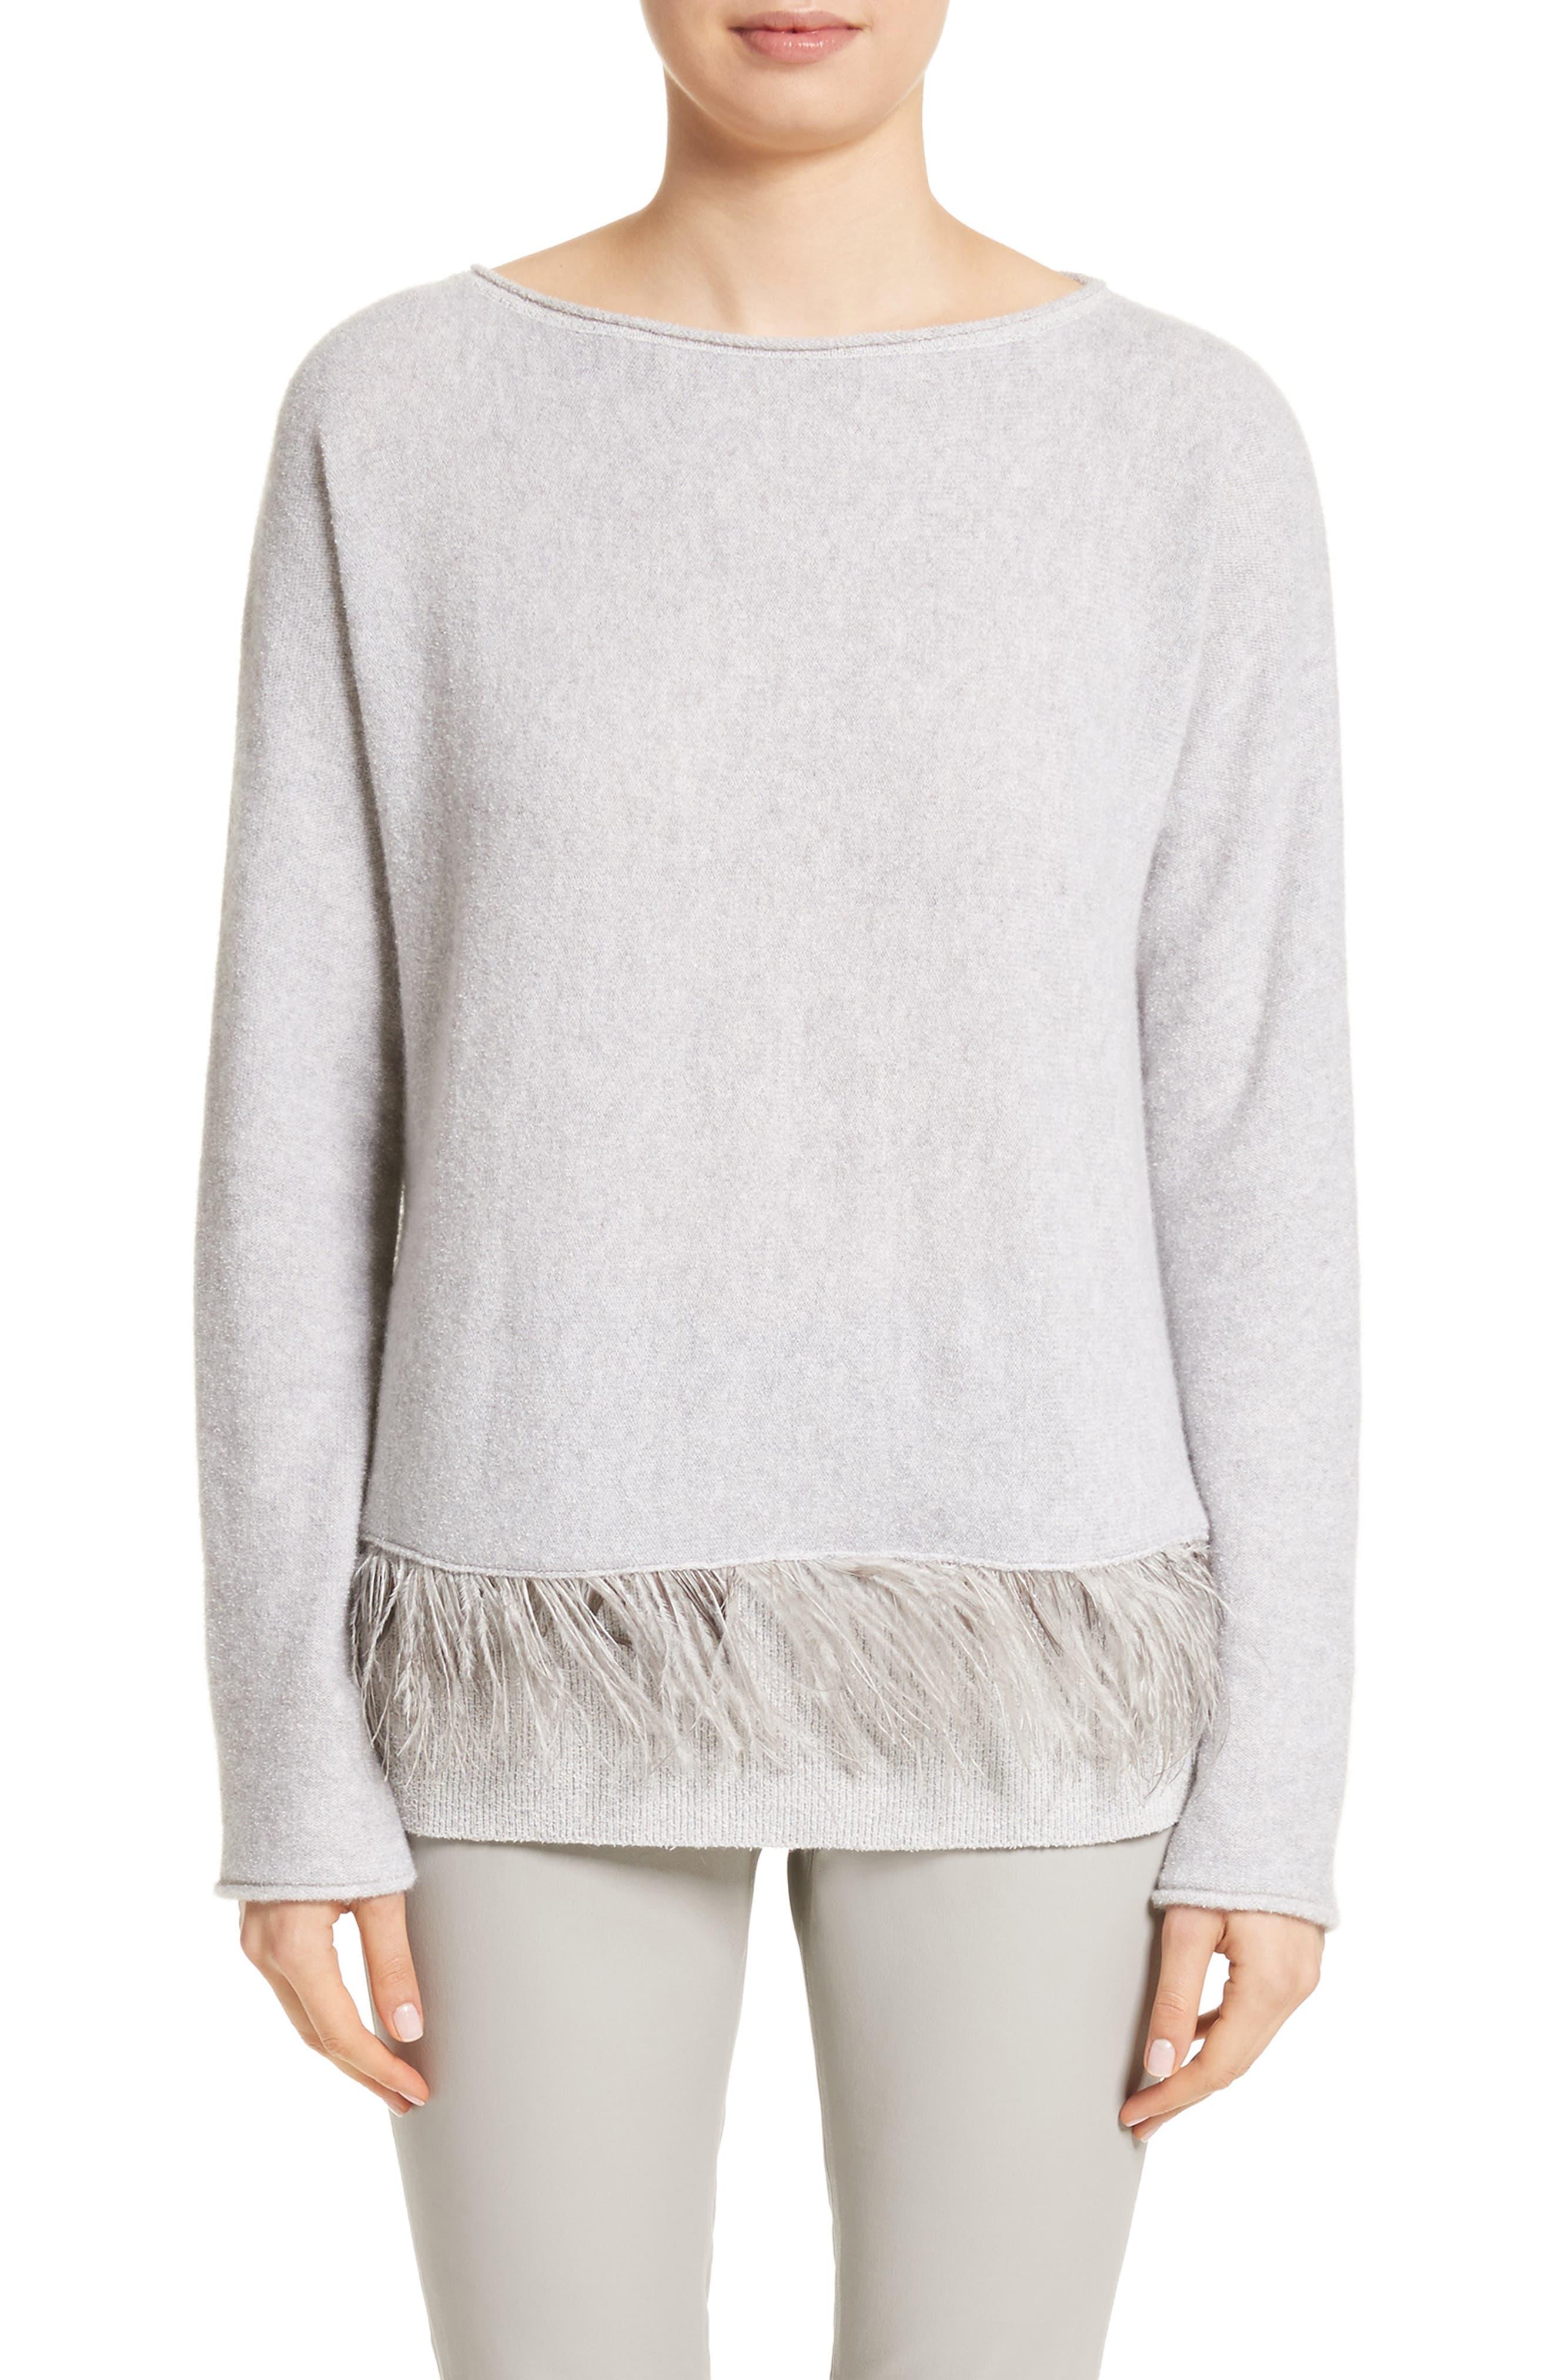 Main Image - Fabiana Filippi Cashmere Blend Sweater with Genuine Ostrich & Turkey Feather Trim